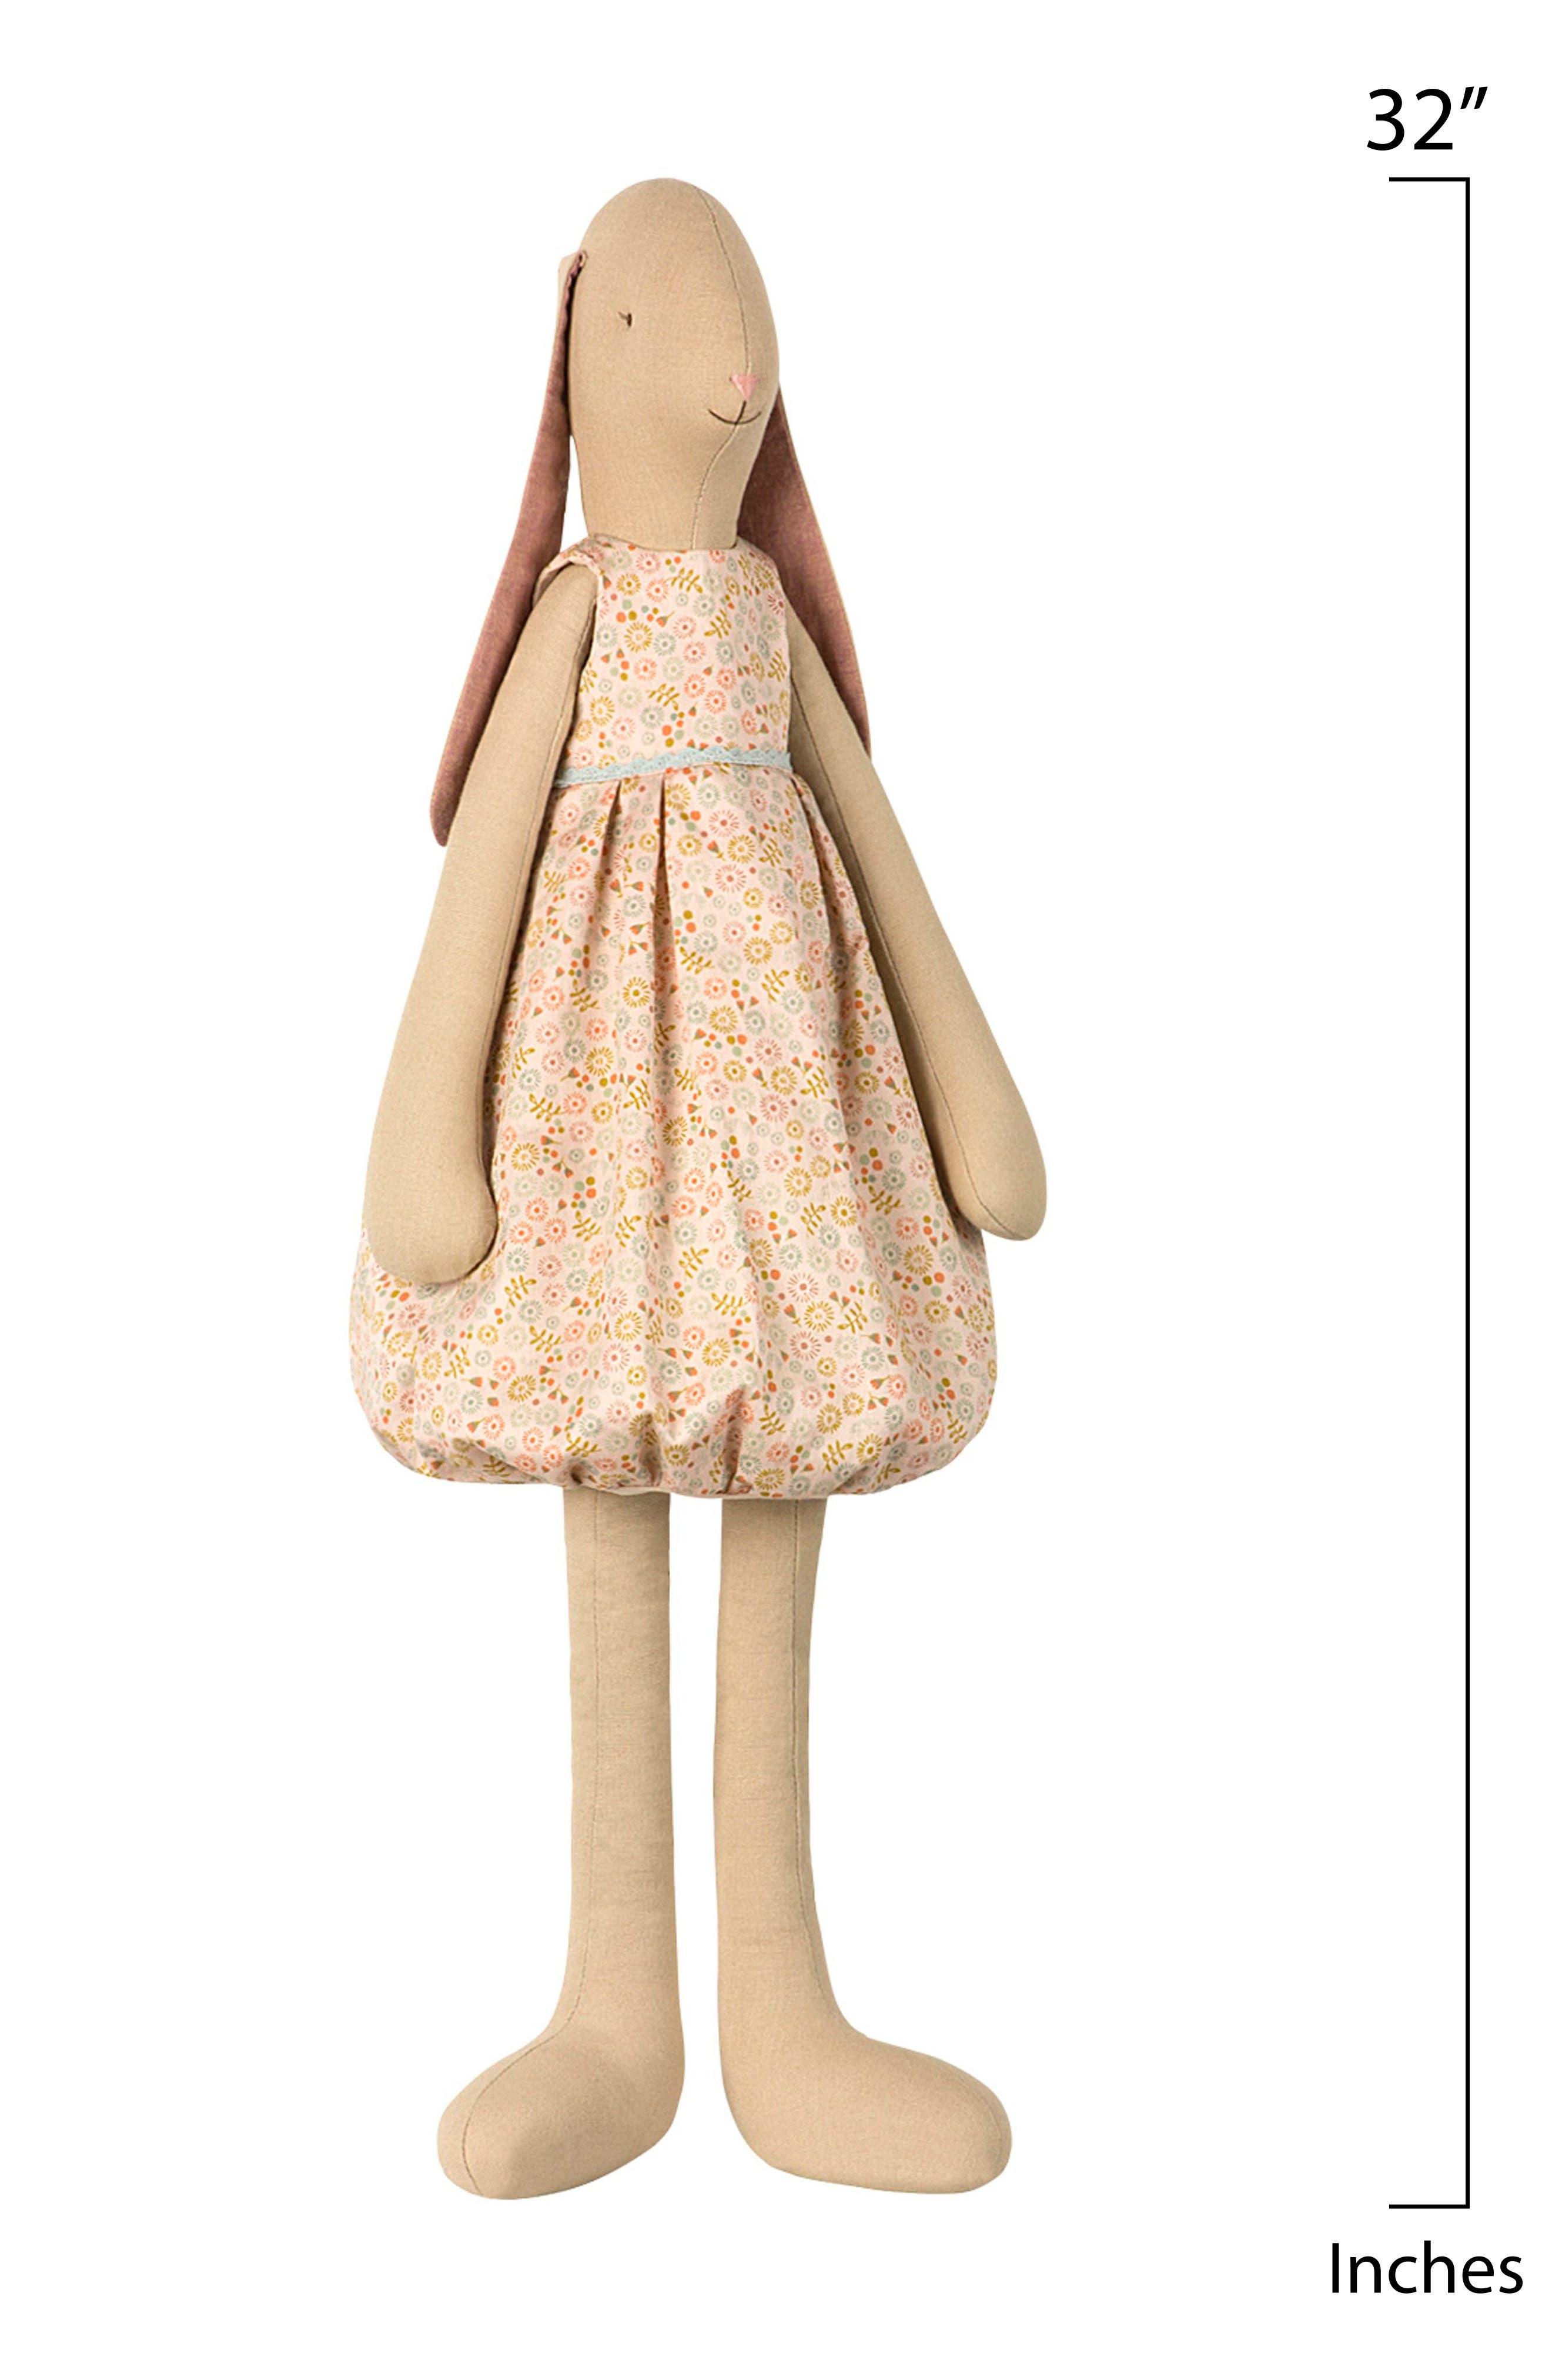 Daisy Mega Vanilla Bunny Stuffed Animal,                             Alternate thumbnail 2, color,                             PEACHE FLORAL DRESS